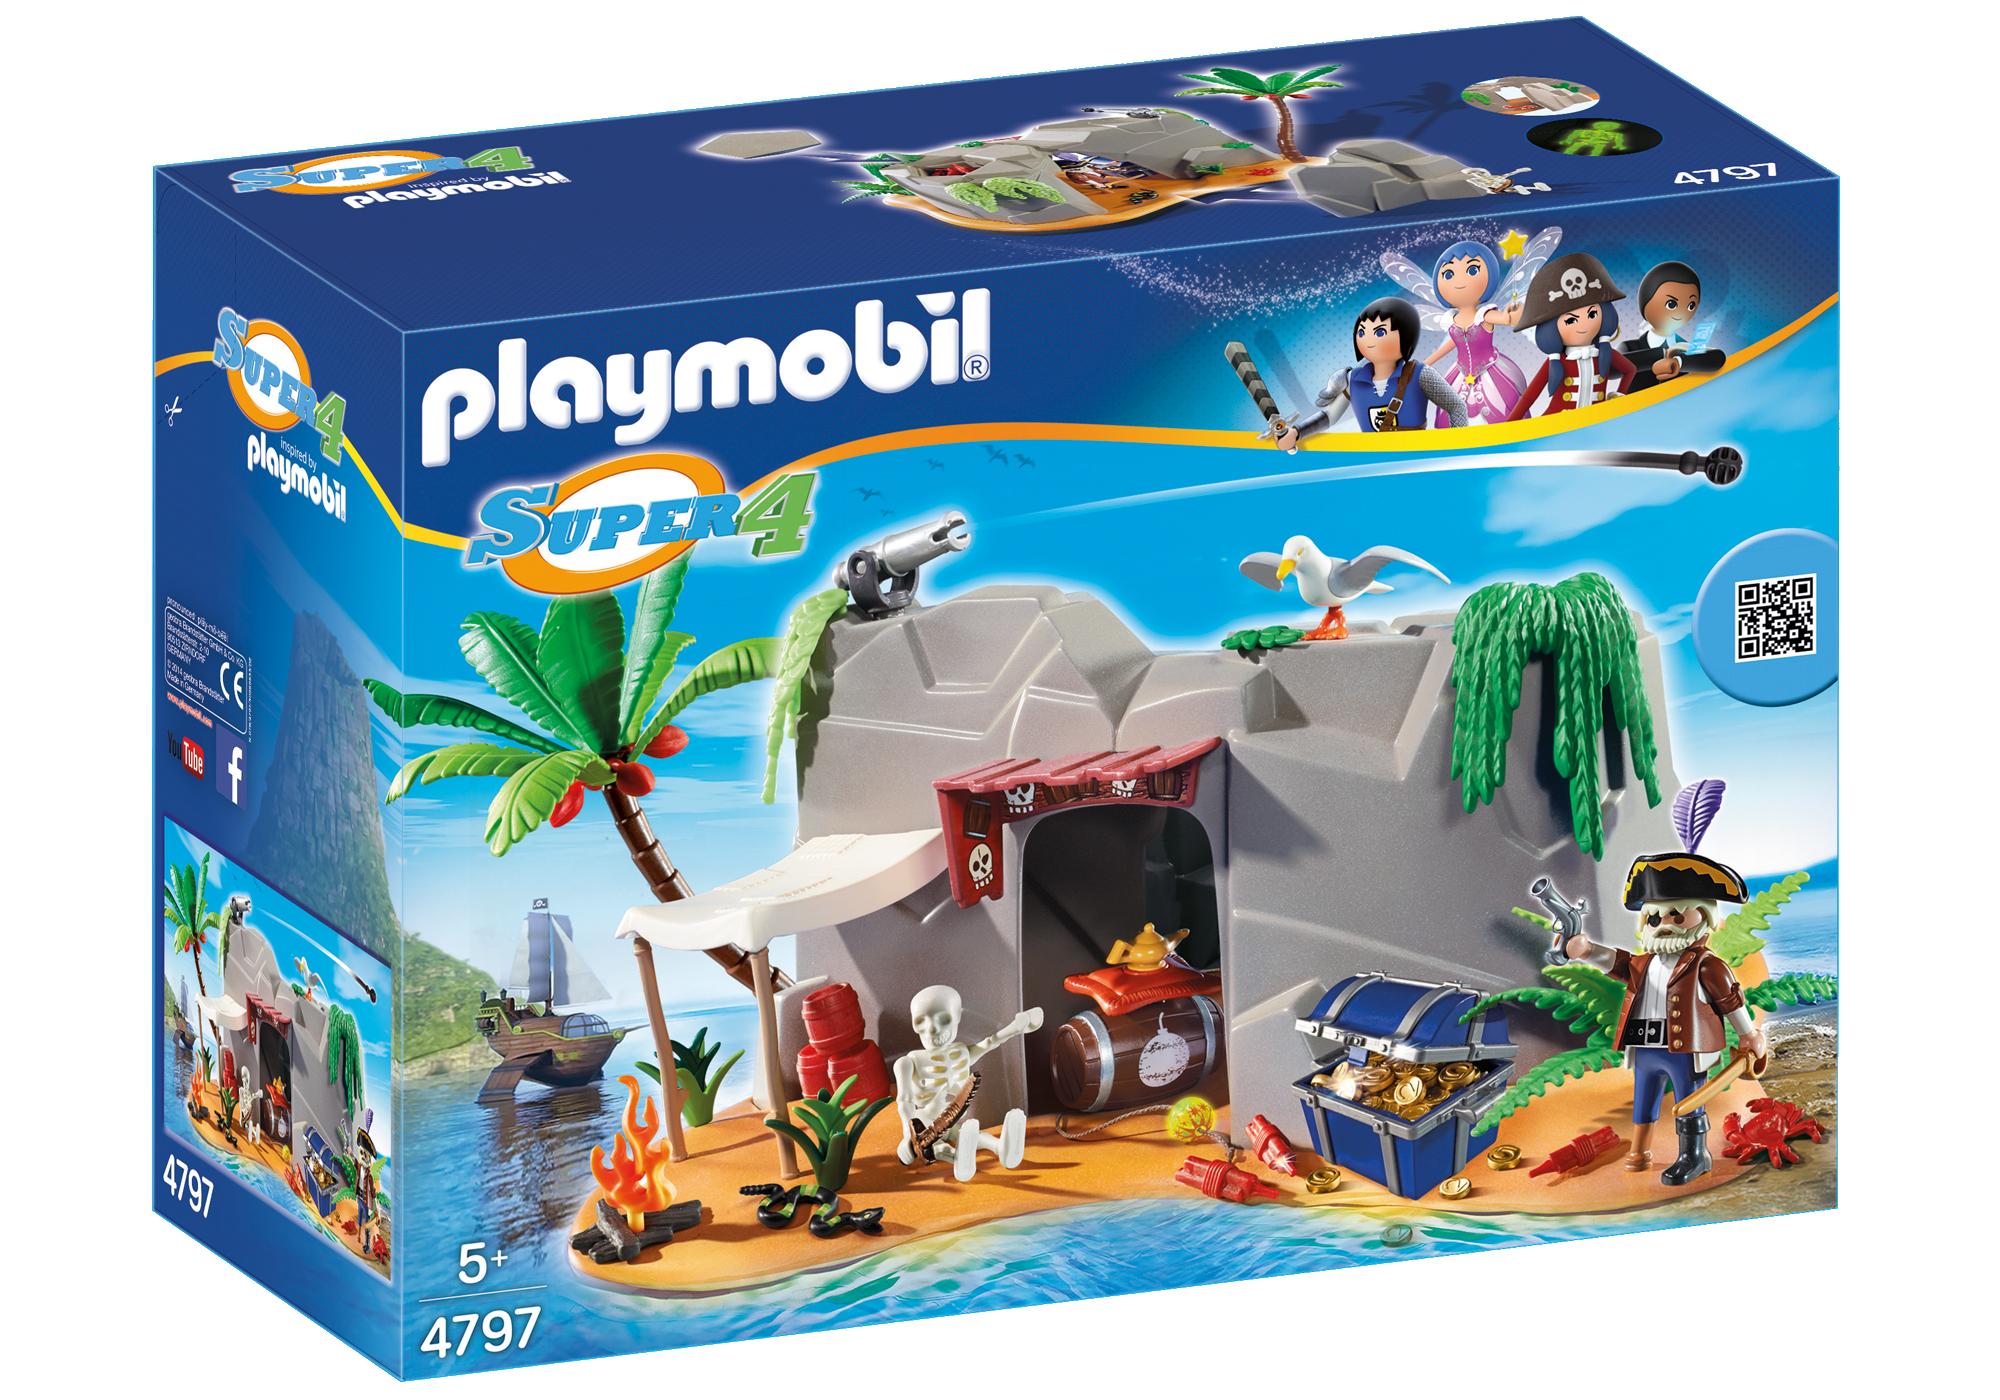 http://media.playmobil.com/i/playmobil/4797_product_box_front